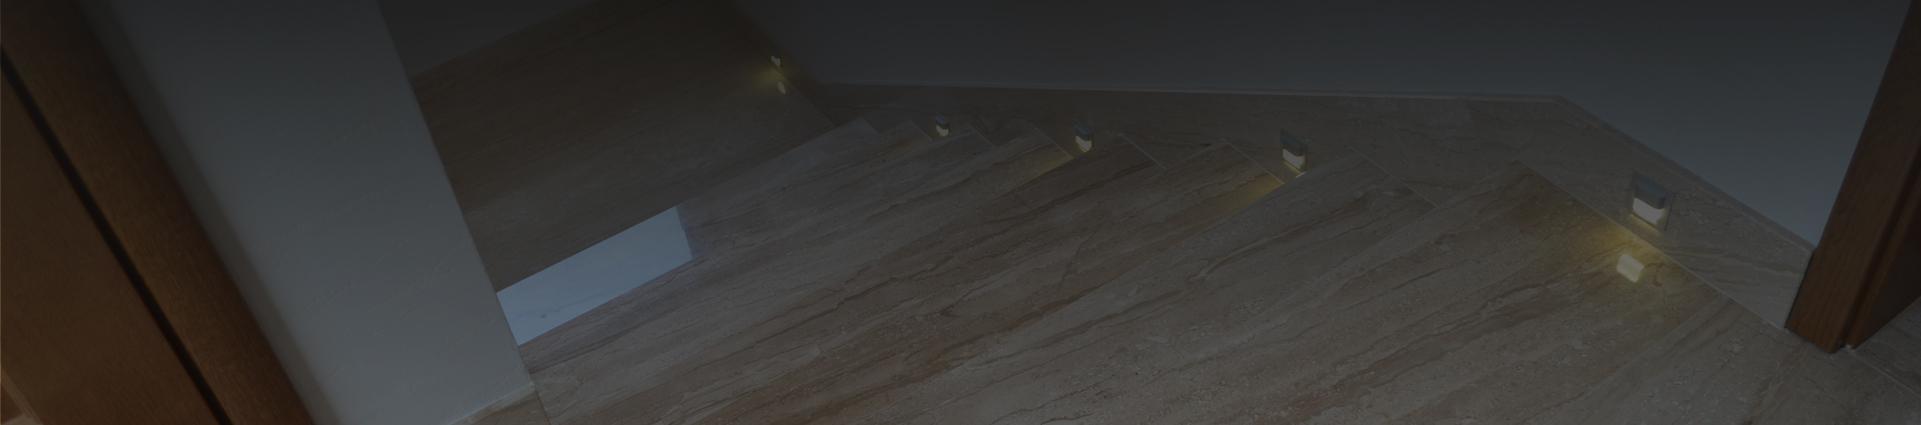 Luksusowe kamienne schody